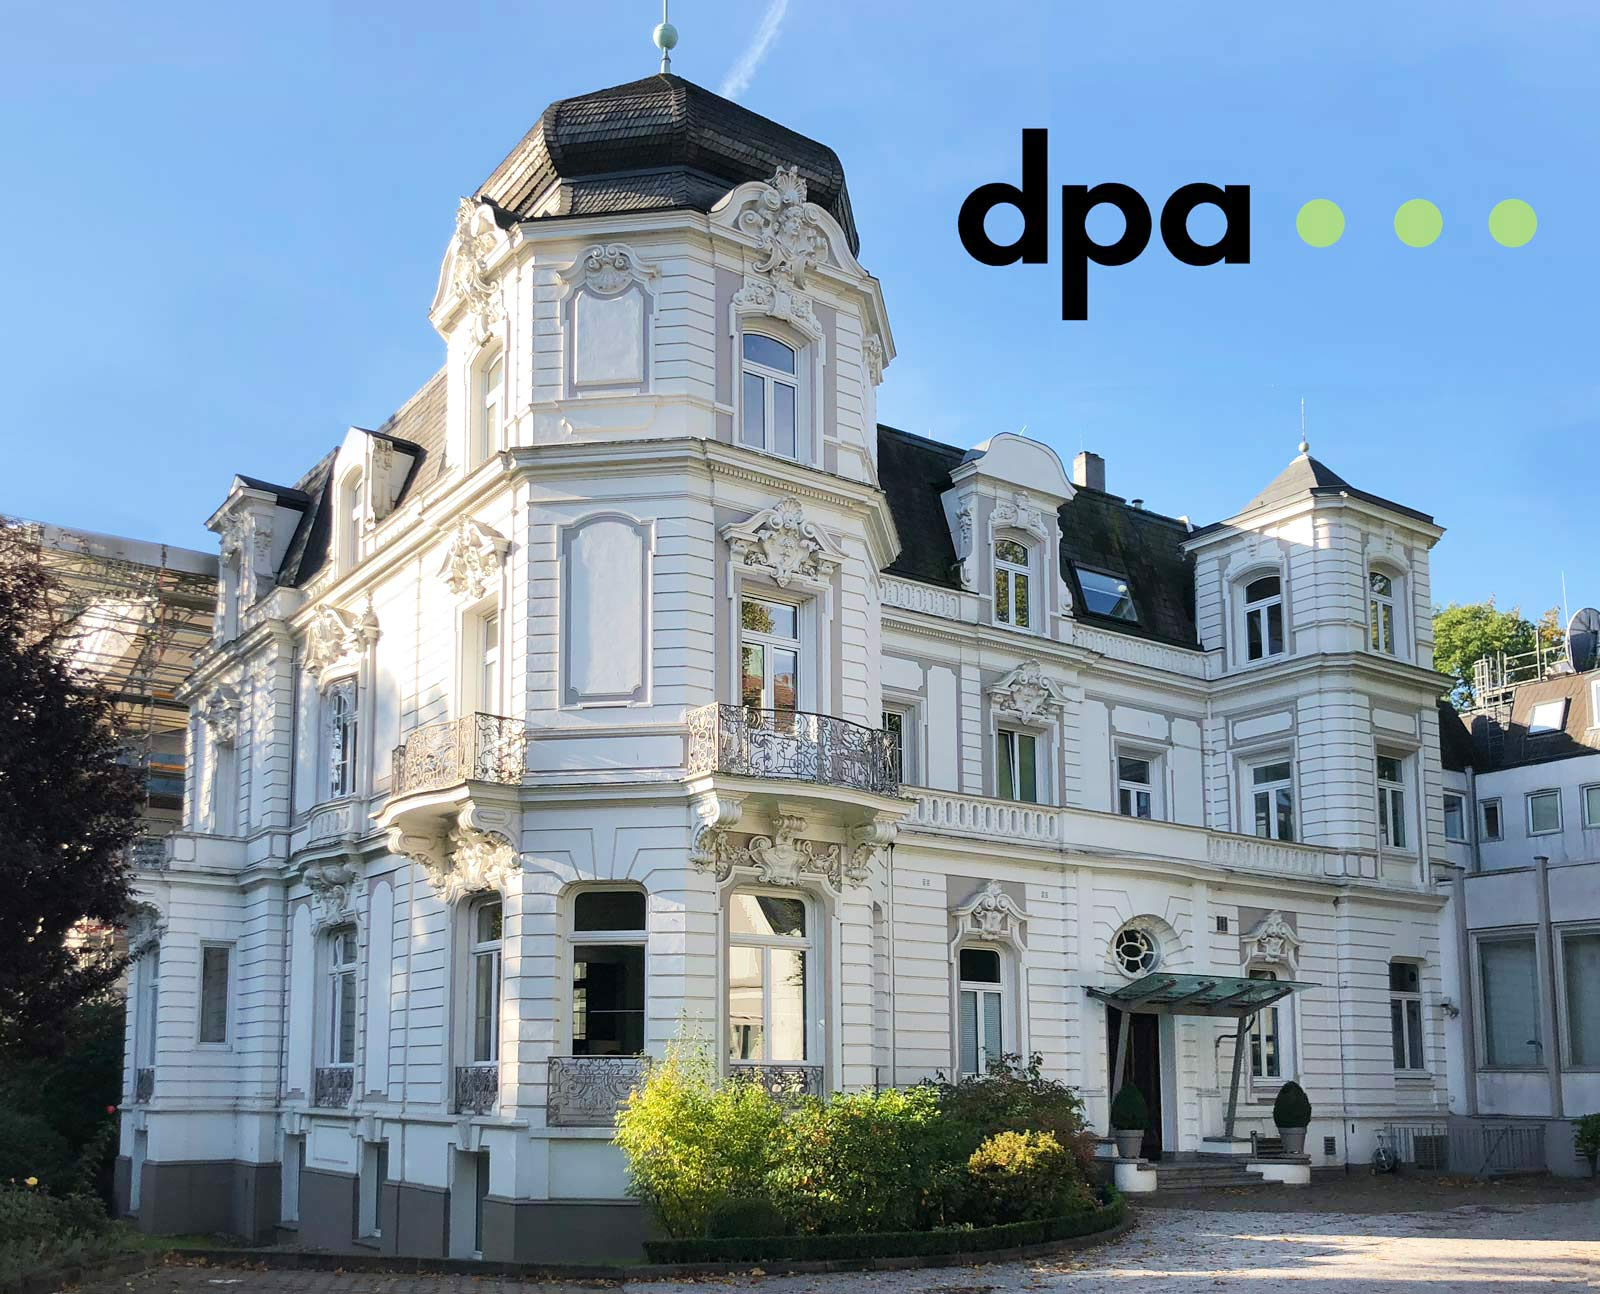 dpa Hamburg Villa